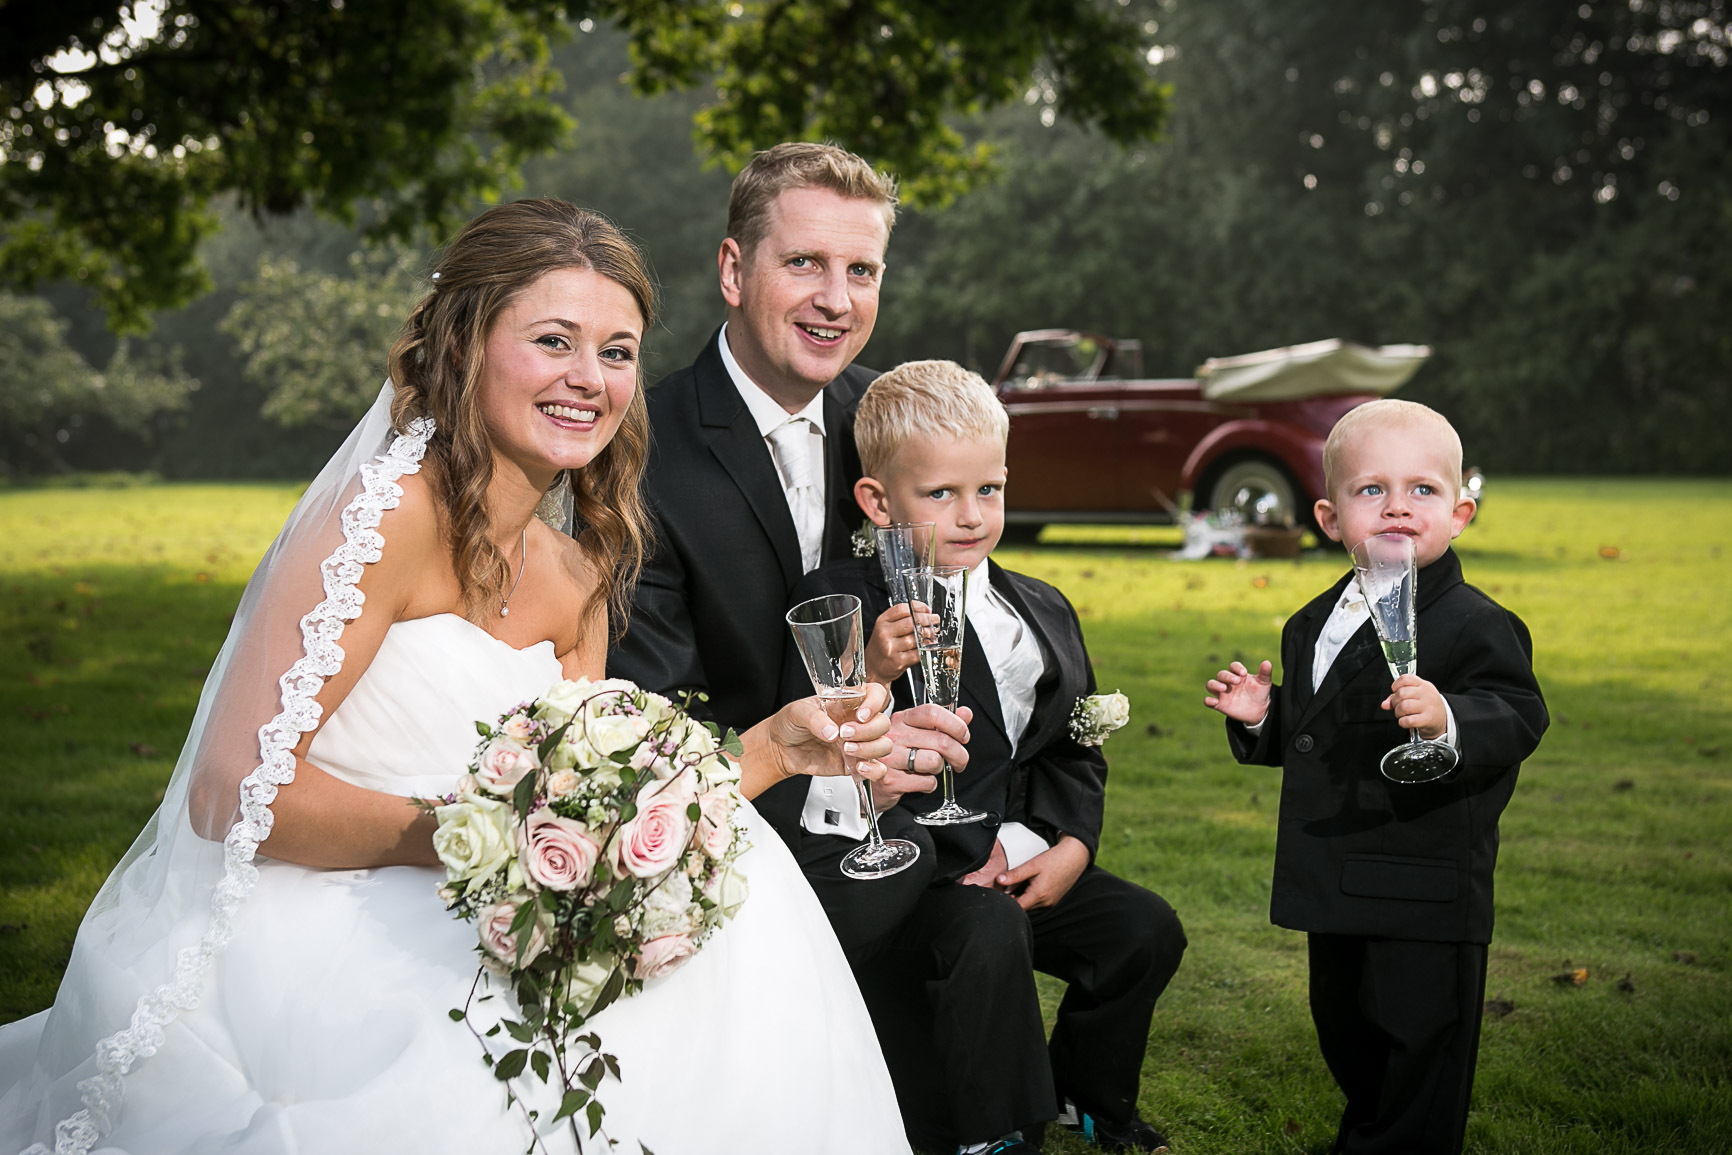 20140923-bryllup-lille-2615.jpg